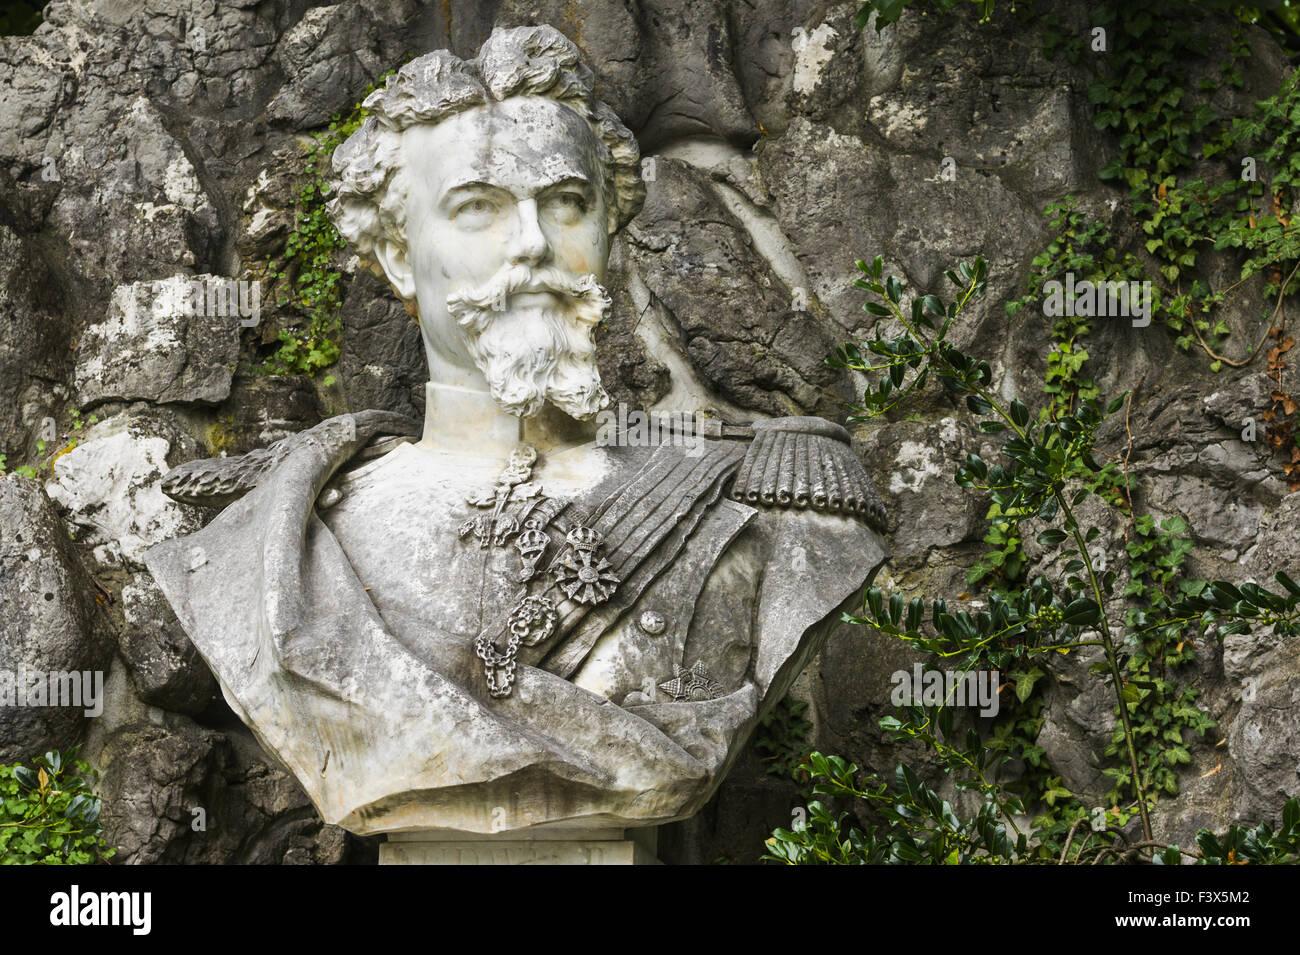 monument showing ludwig II of bavaria - Stock Image